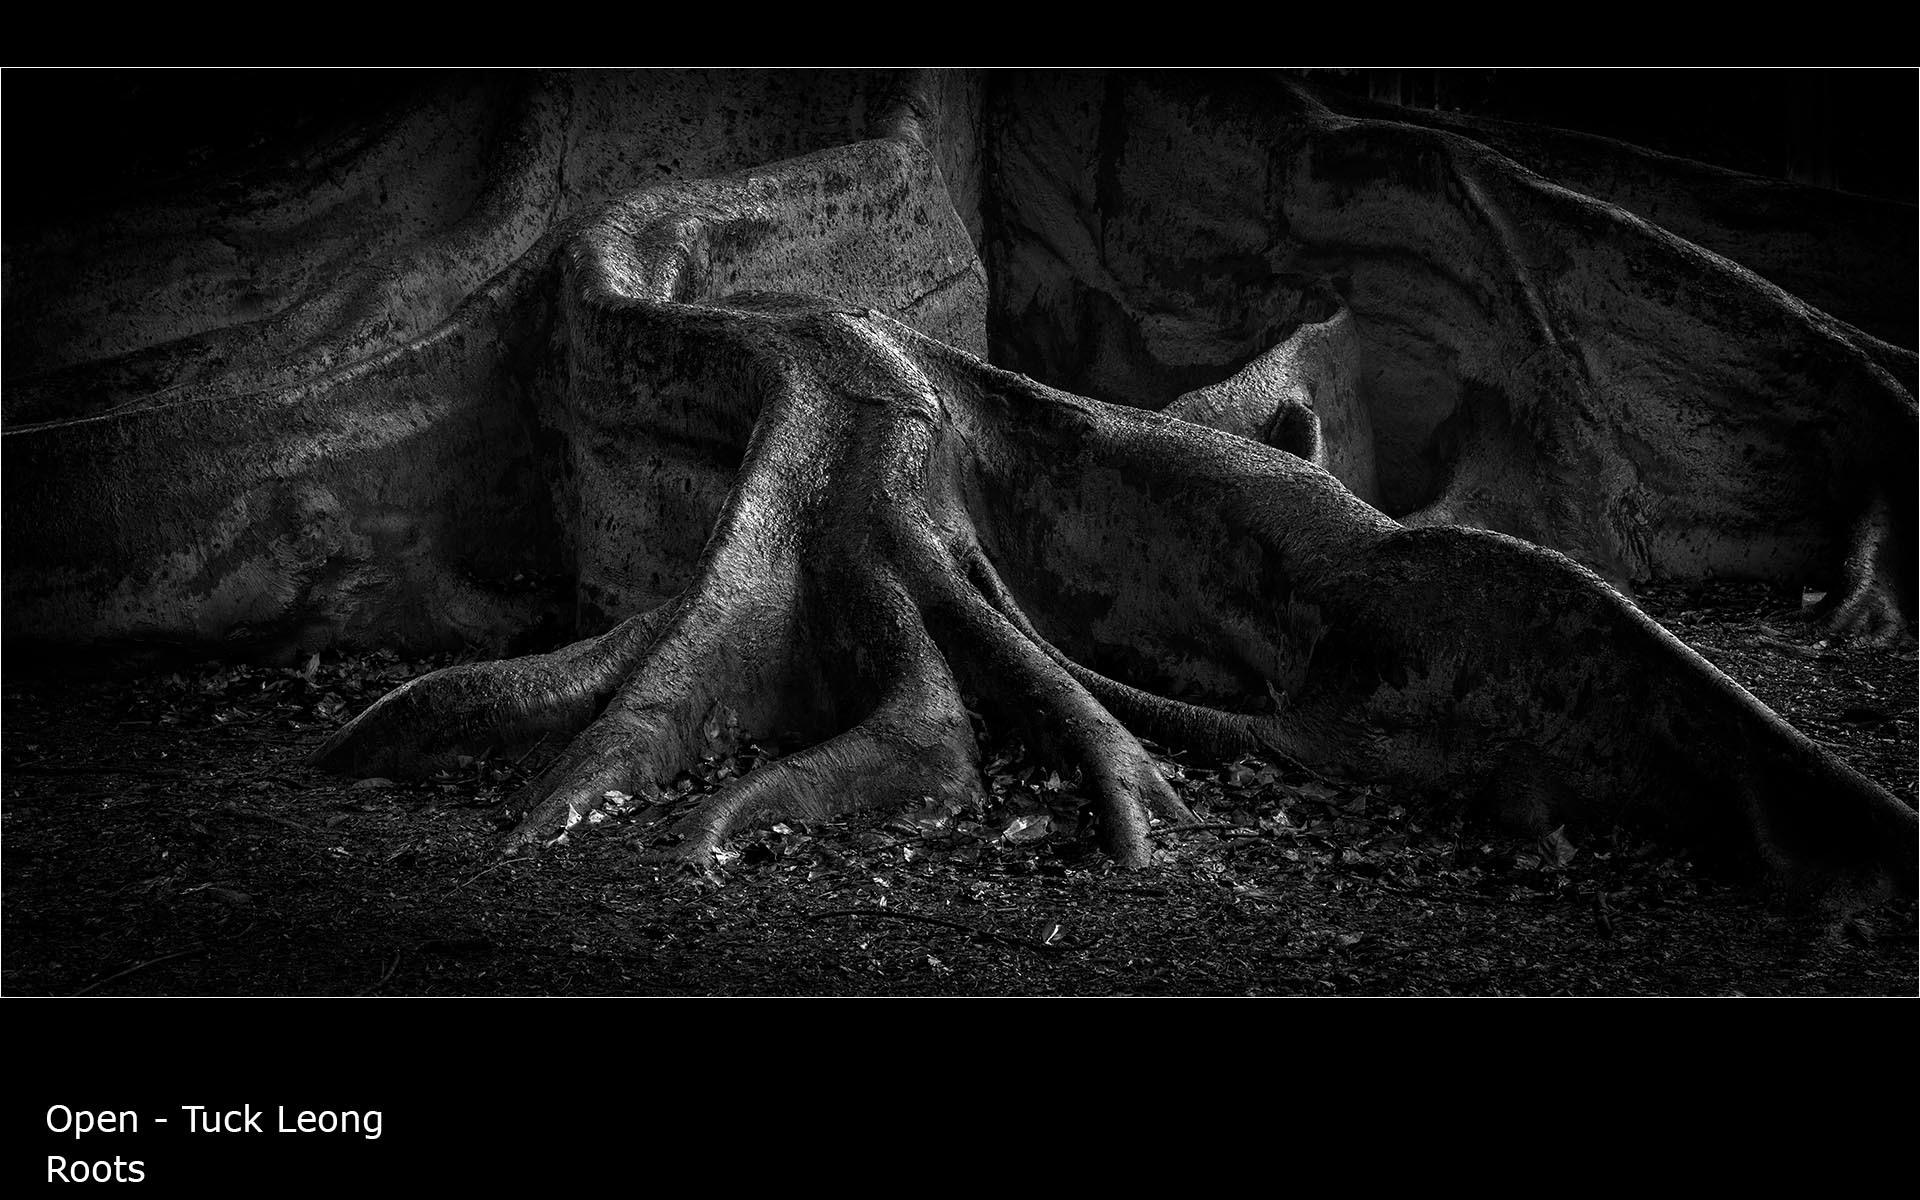 Roots - Tuck Leong